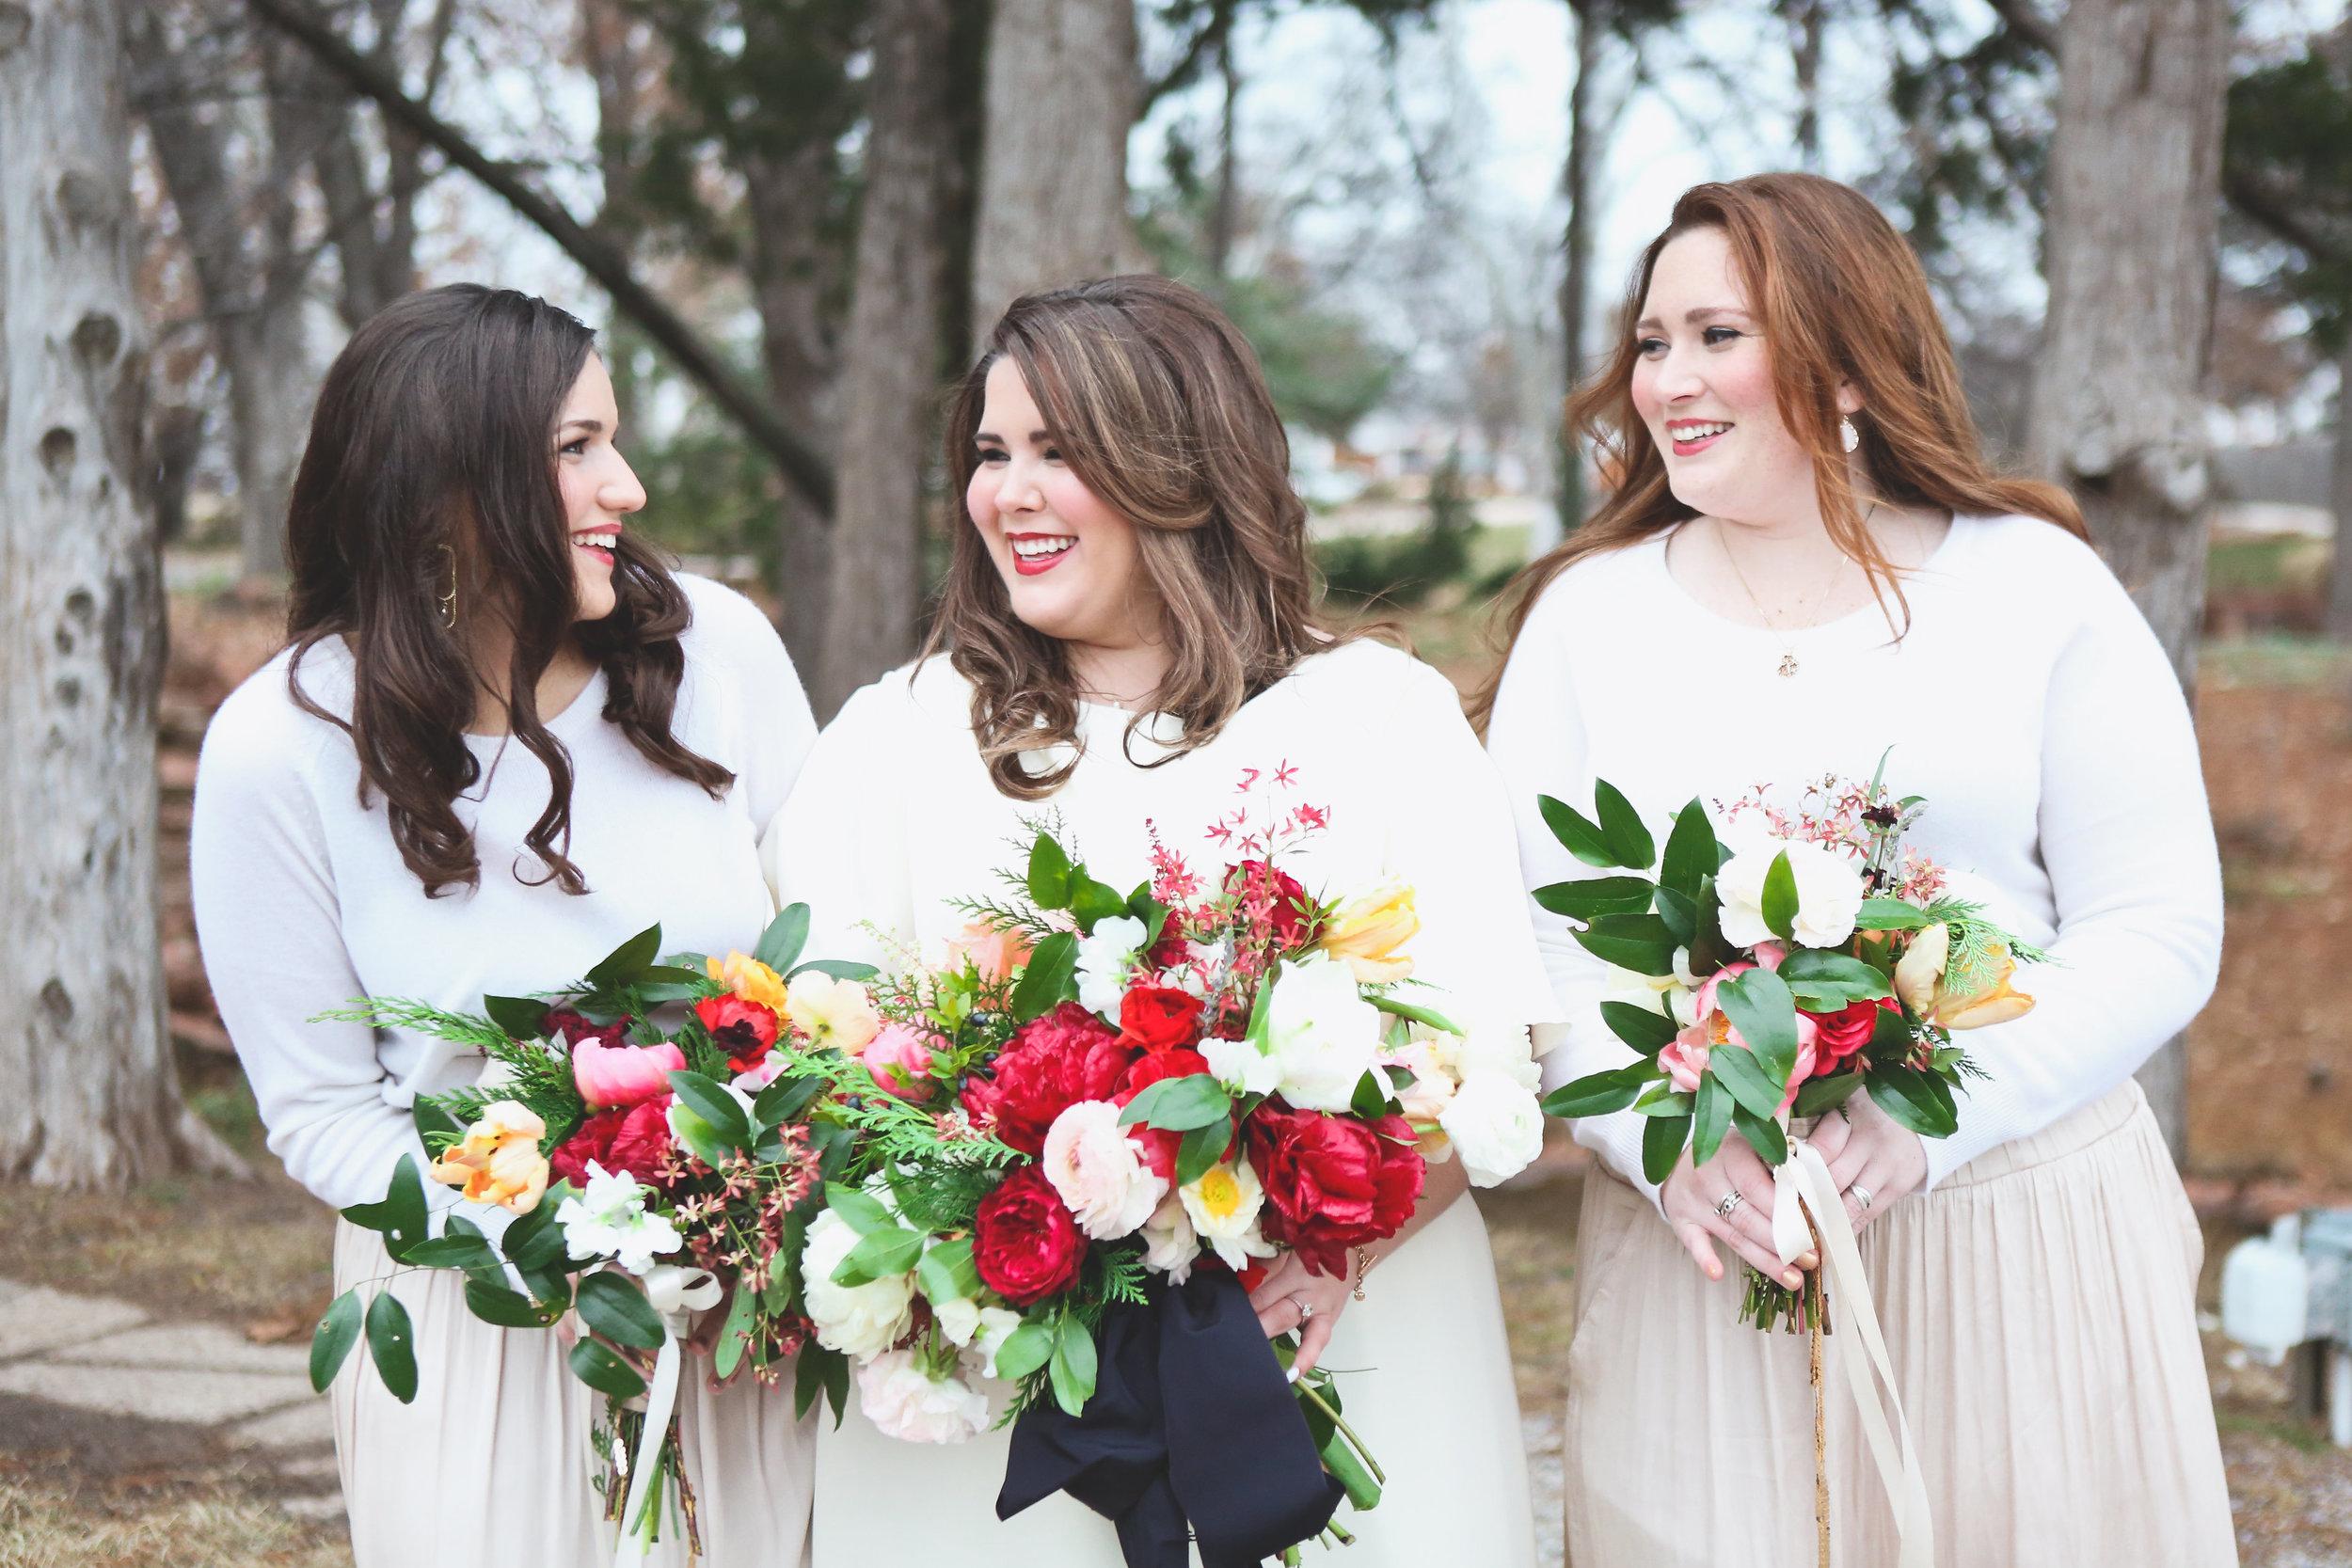 HannahHudsonPhotography.JessieandJustin.WeddingParty-28.jpeg